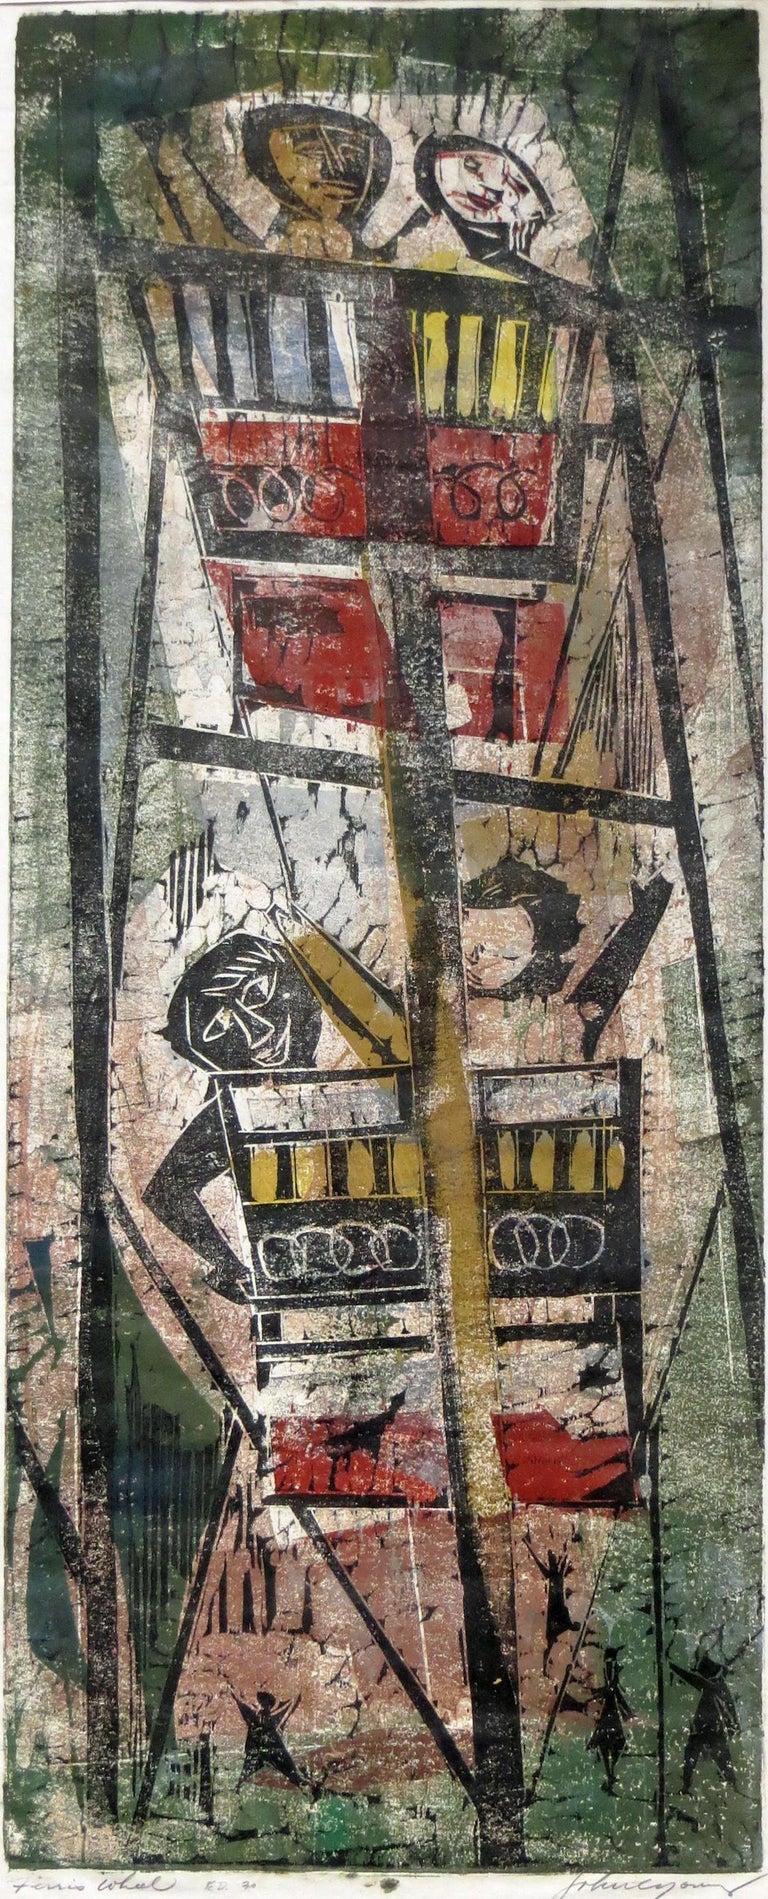 John Chin Young Abstract Print - Ferris Wheel